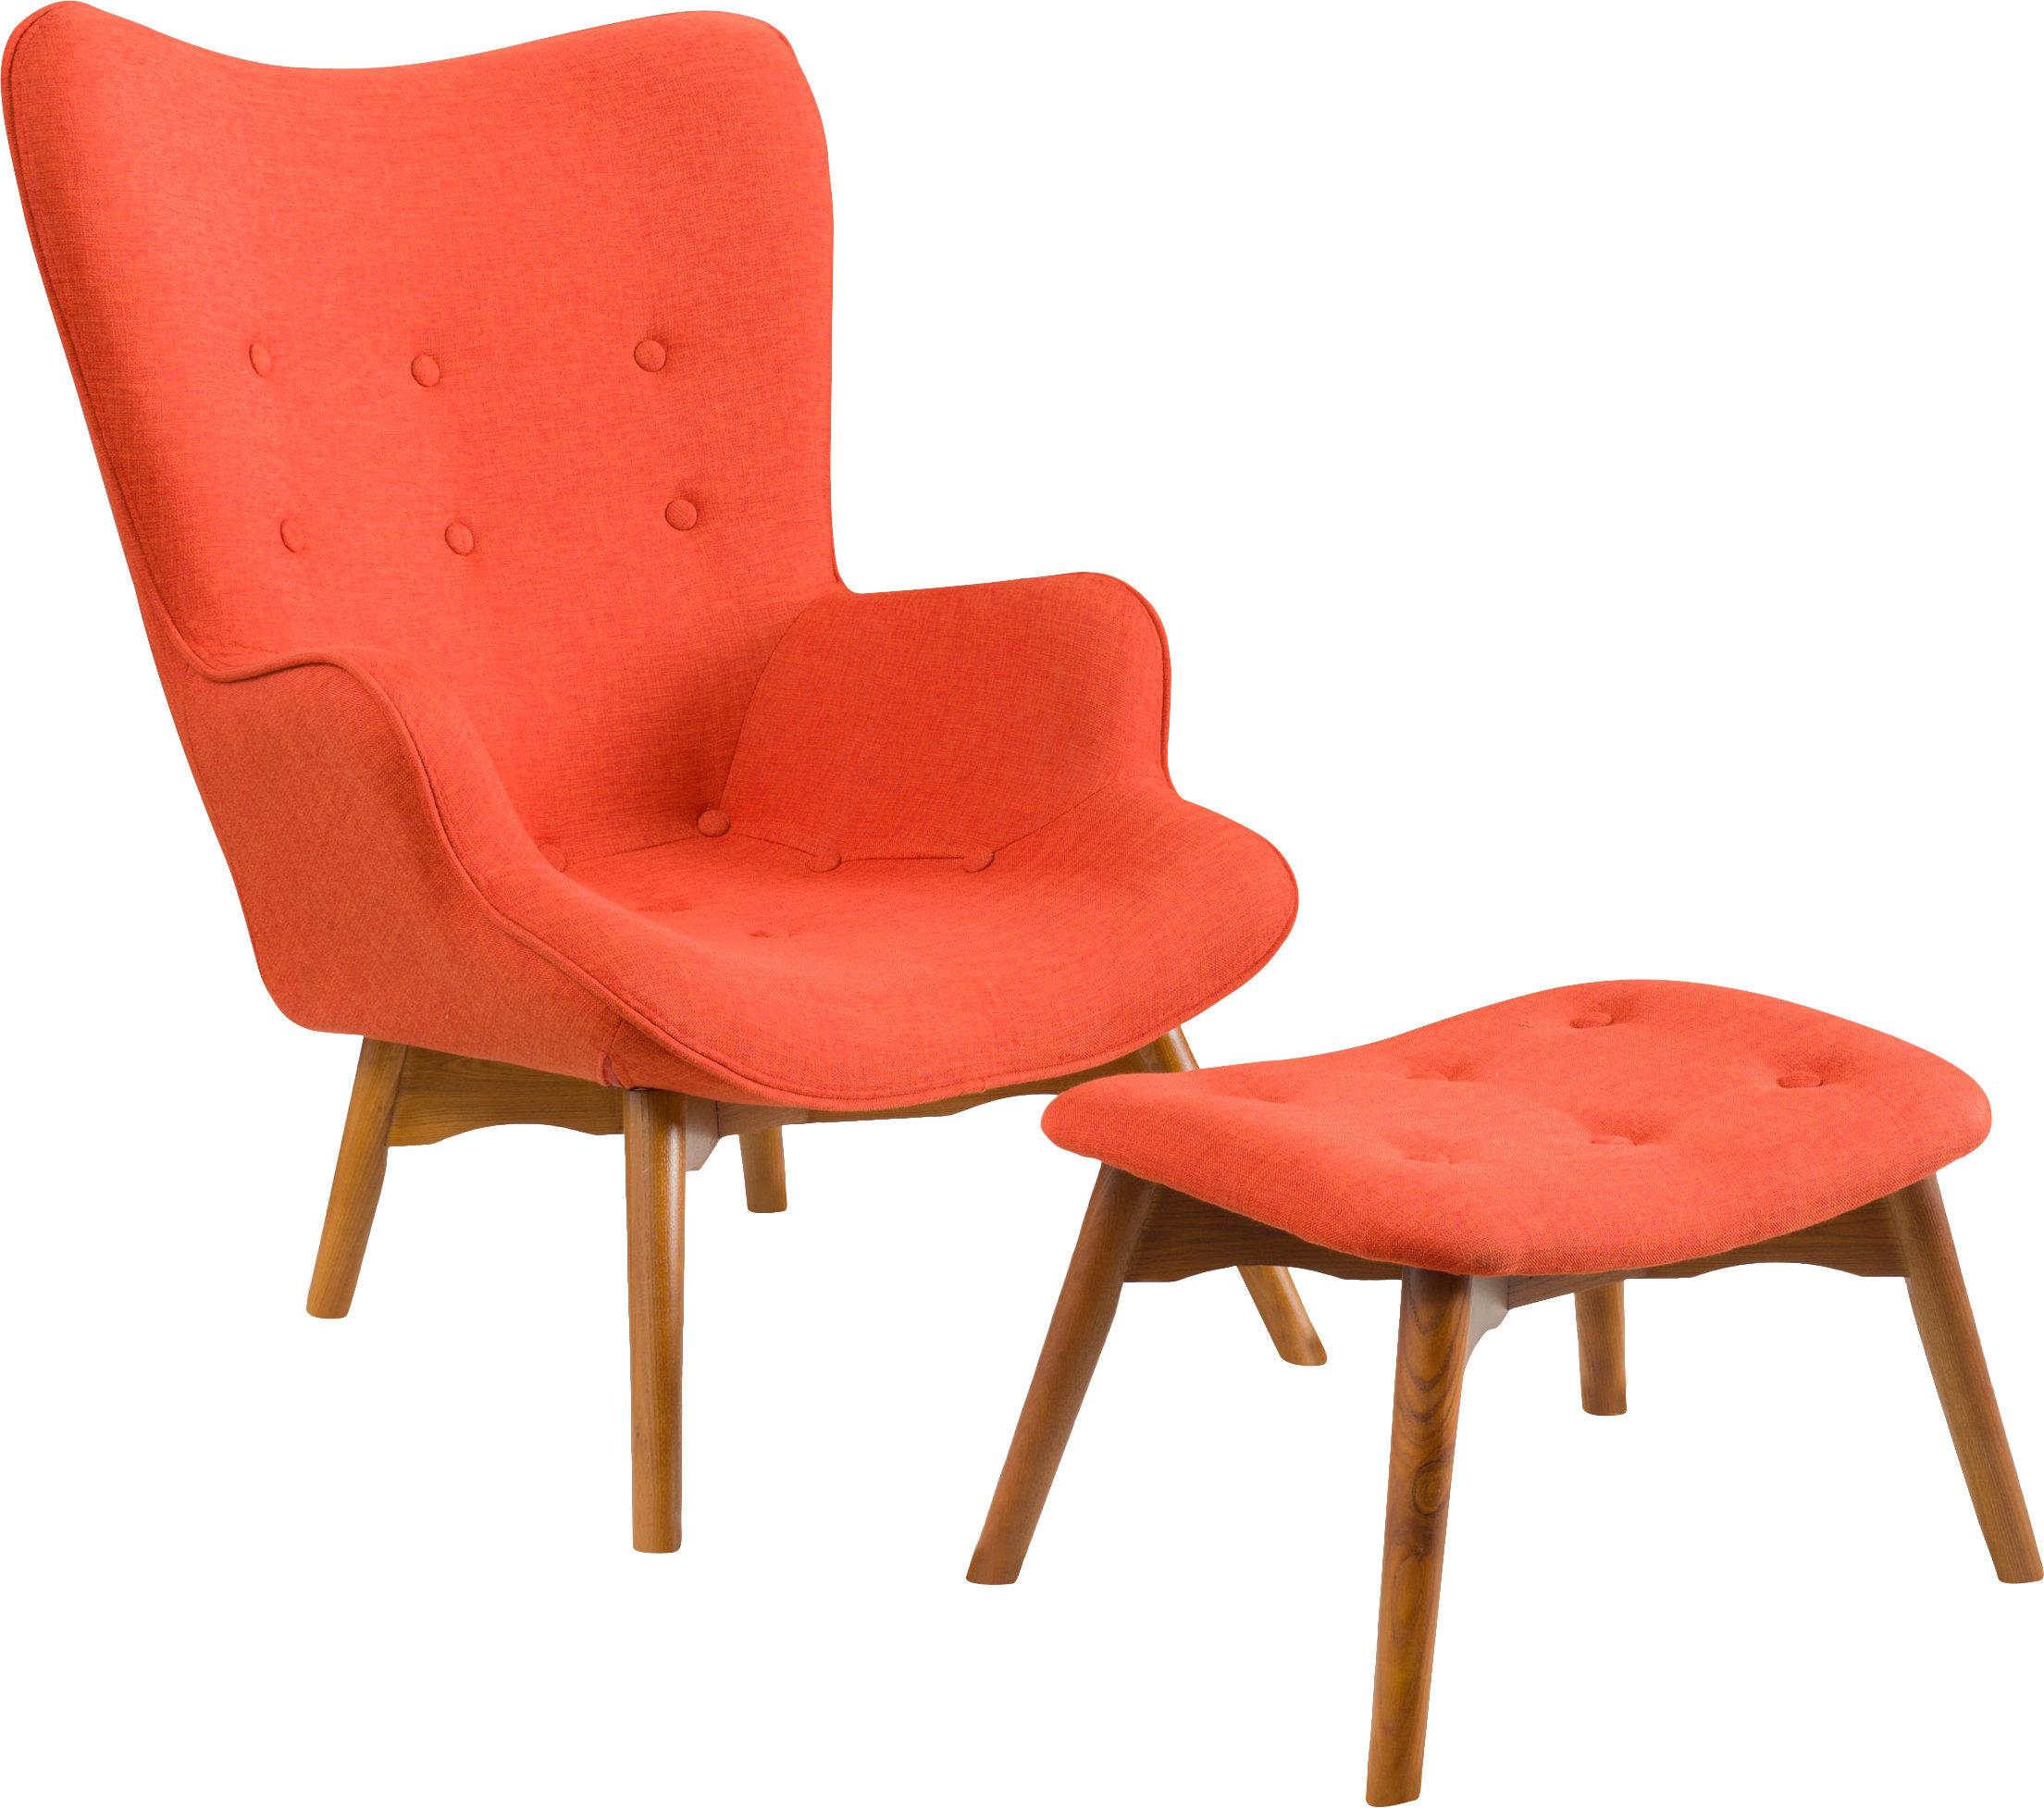 Astounding Canyon Vista Lounge Chair And Ottoman Alphanode Cool Chair Designs And Ideas Alphanodeonline